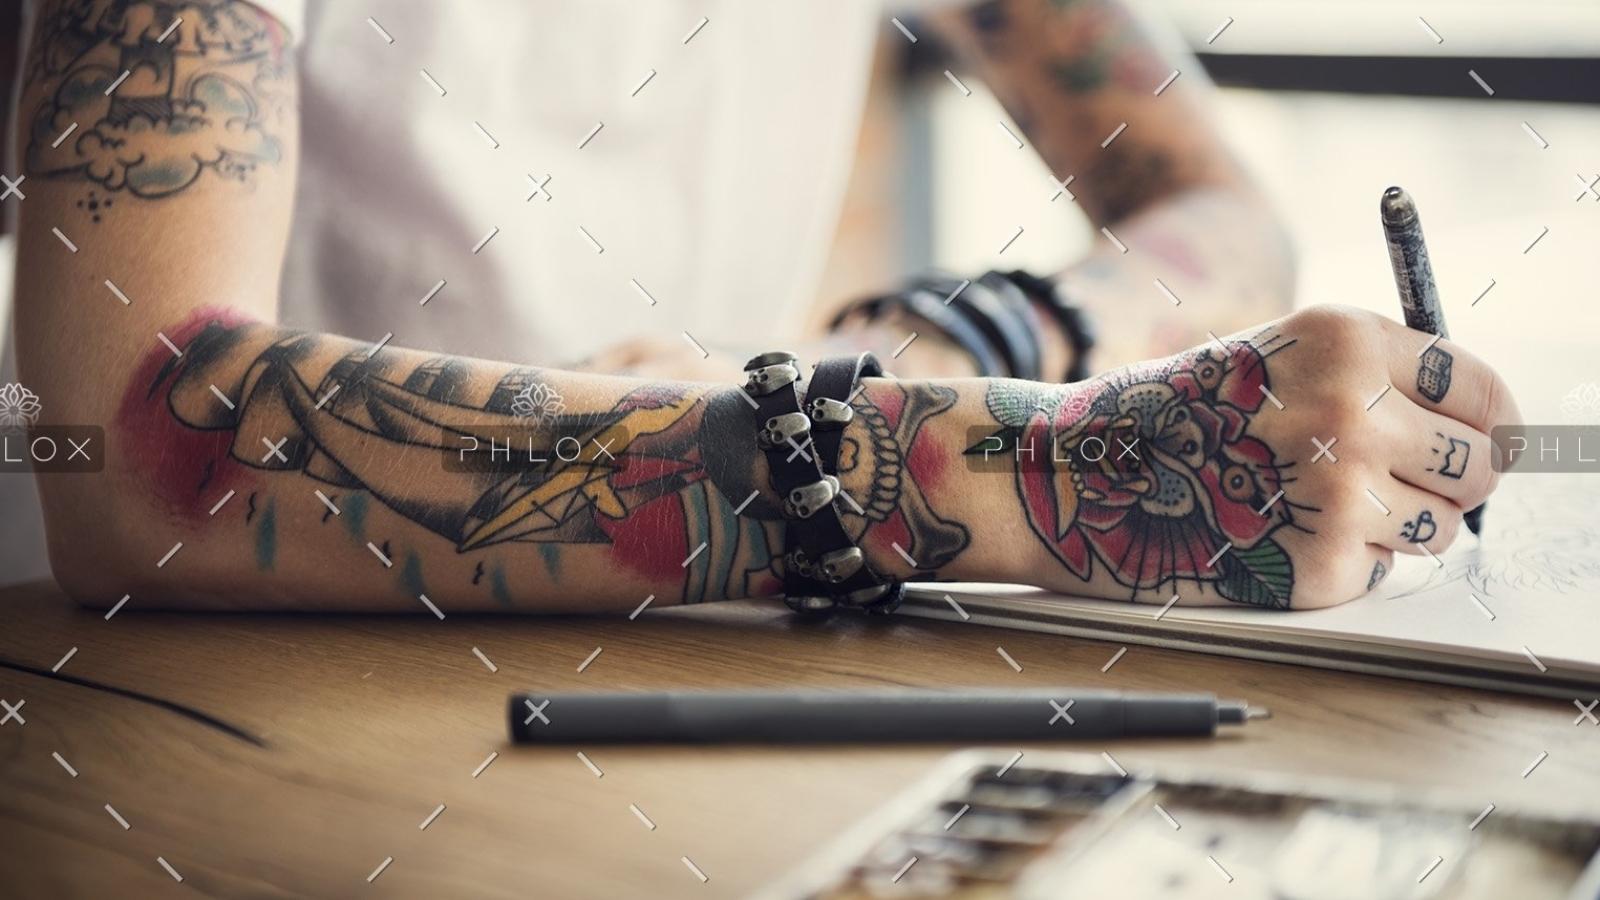 demo-attachment-330-tattoo-woman-creative-ideas-design-inspiration-PJPDDTA1-1